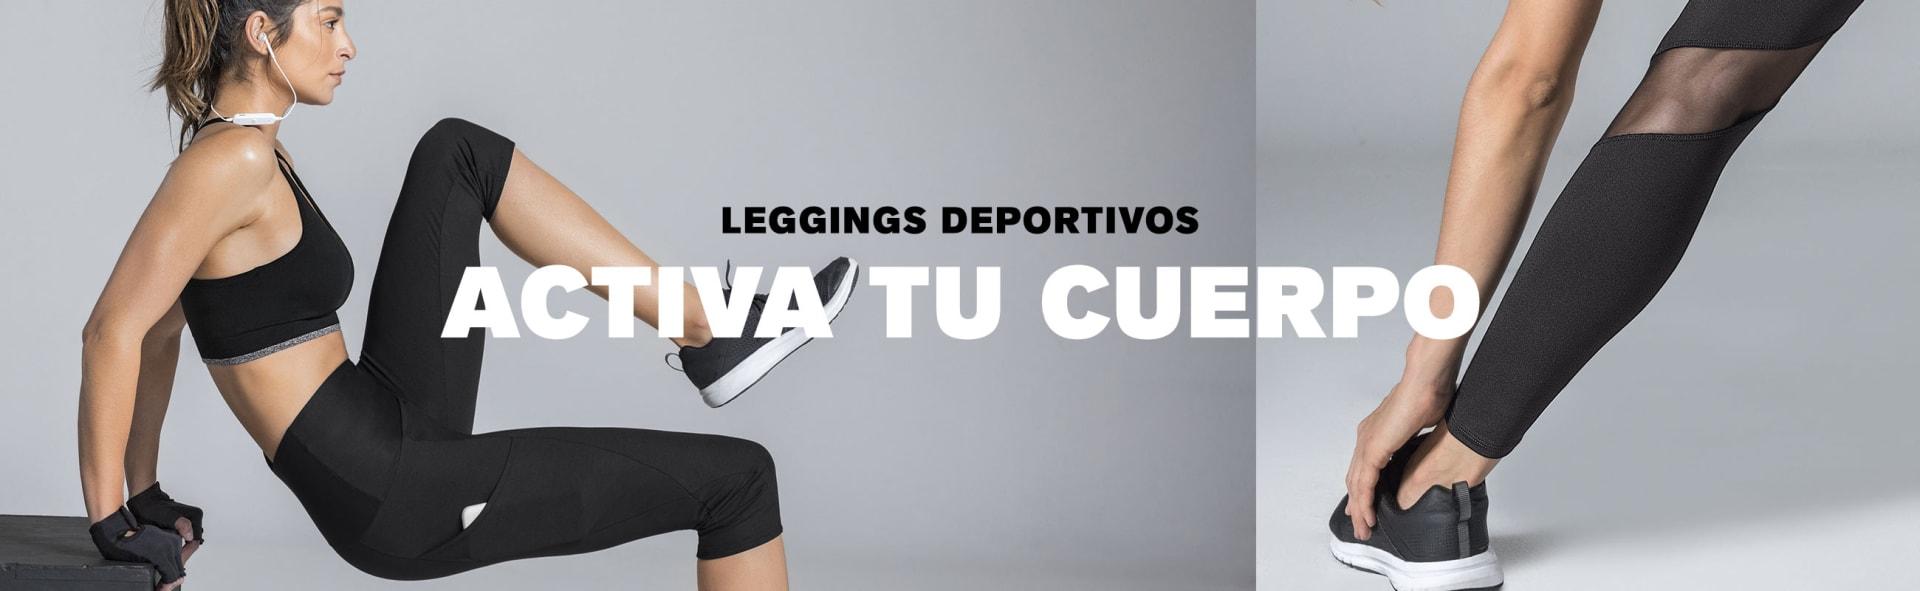 Leggings Deportivos Leonisa